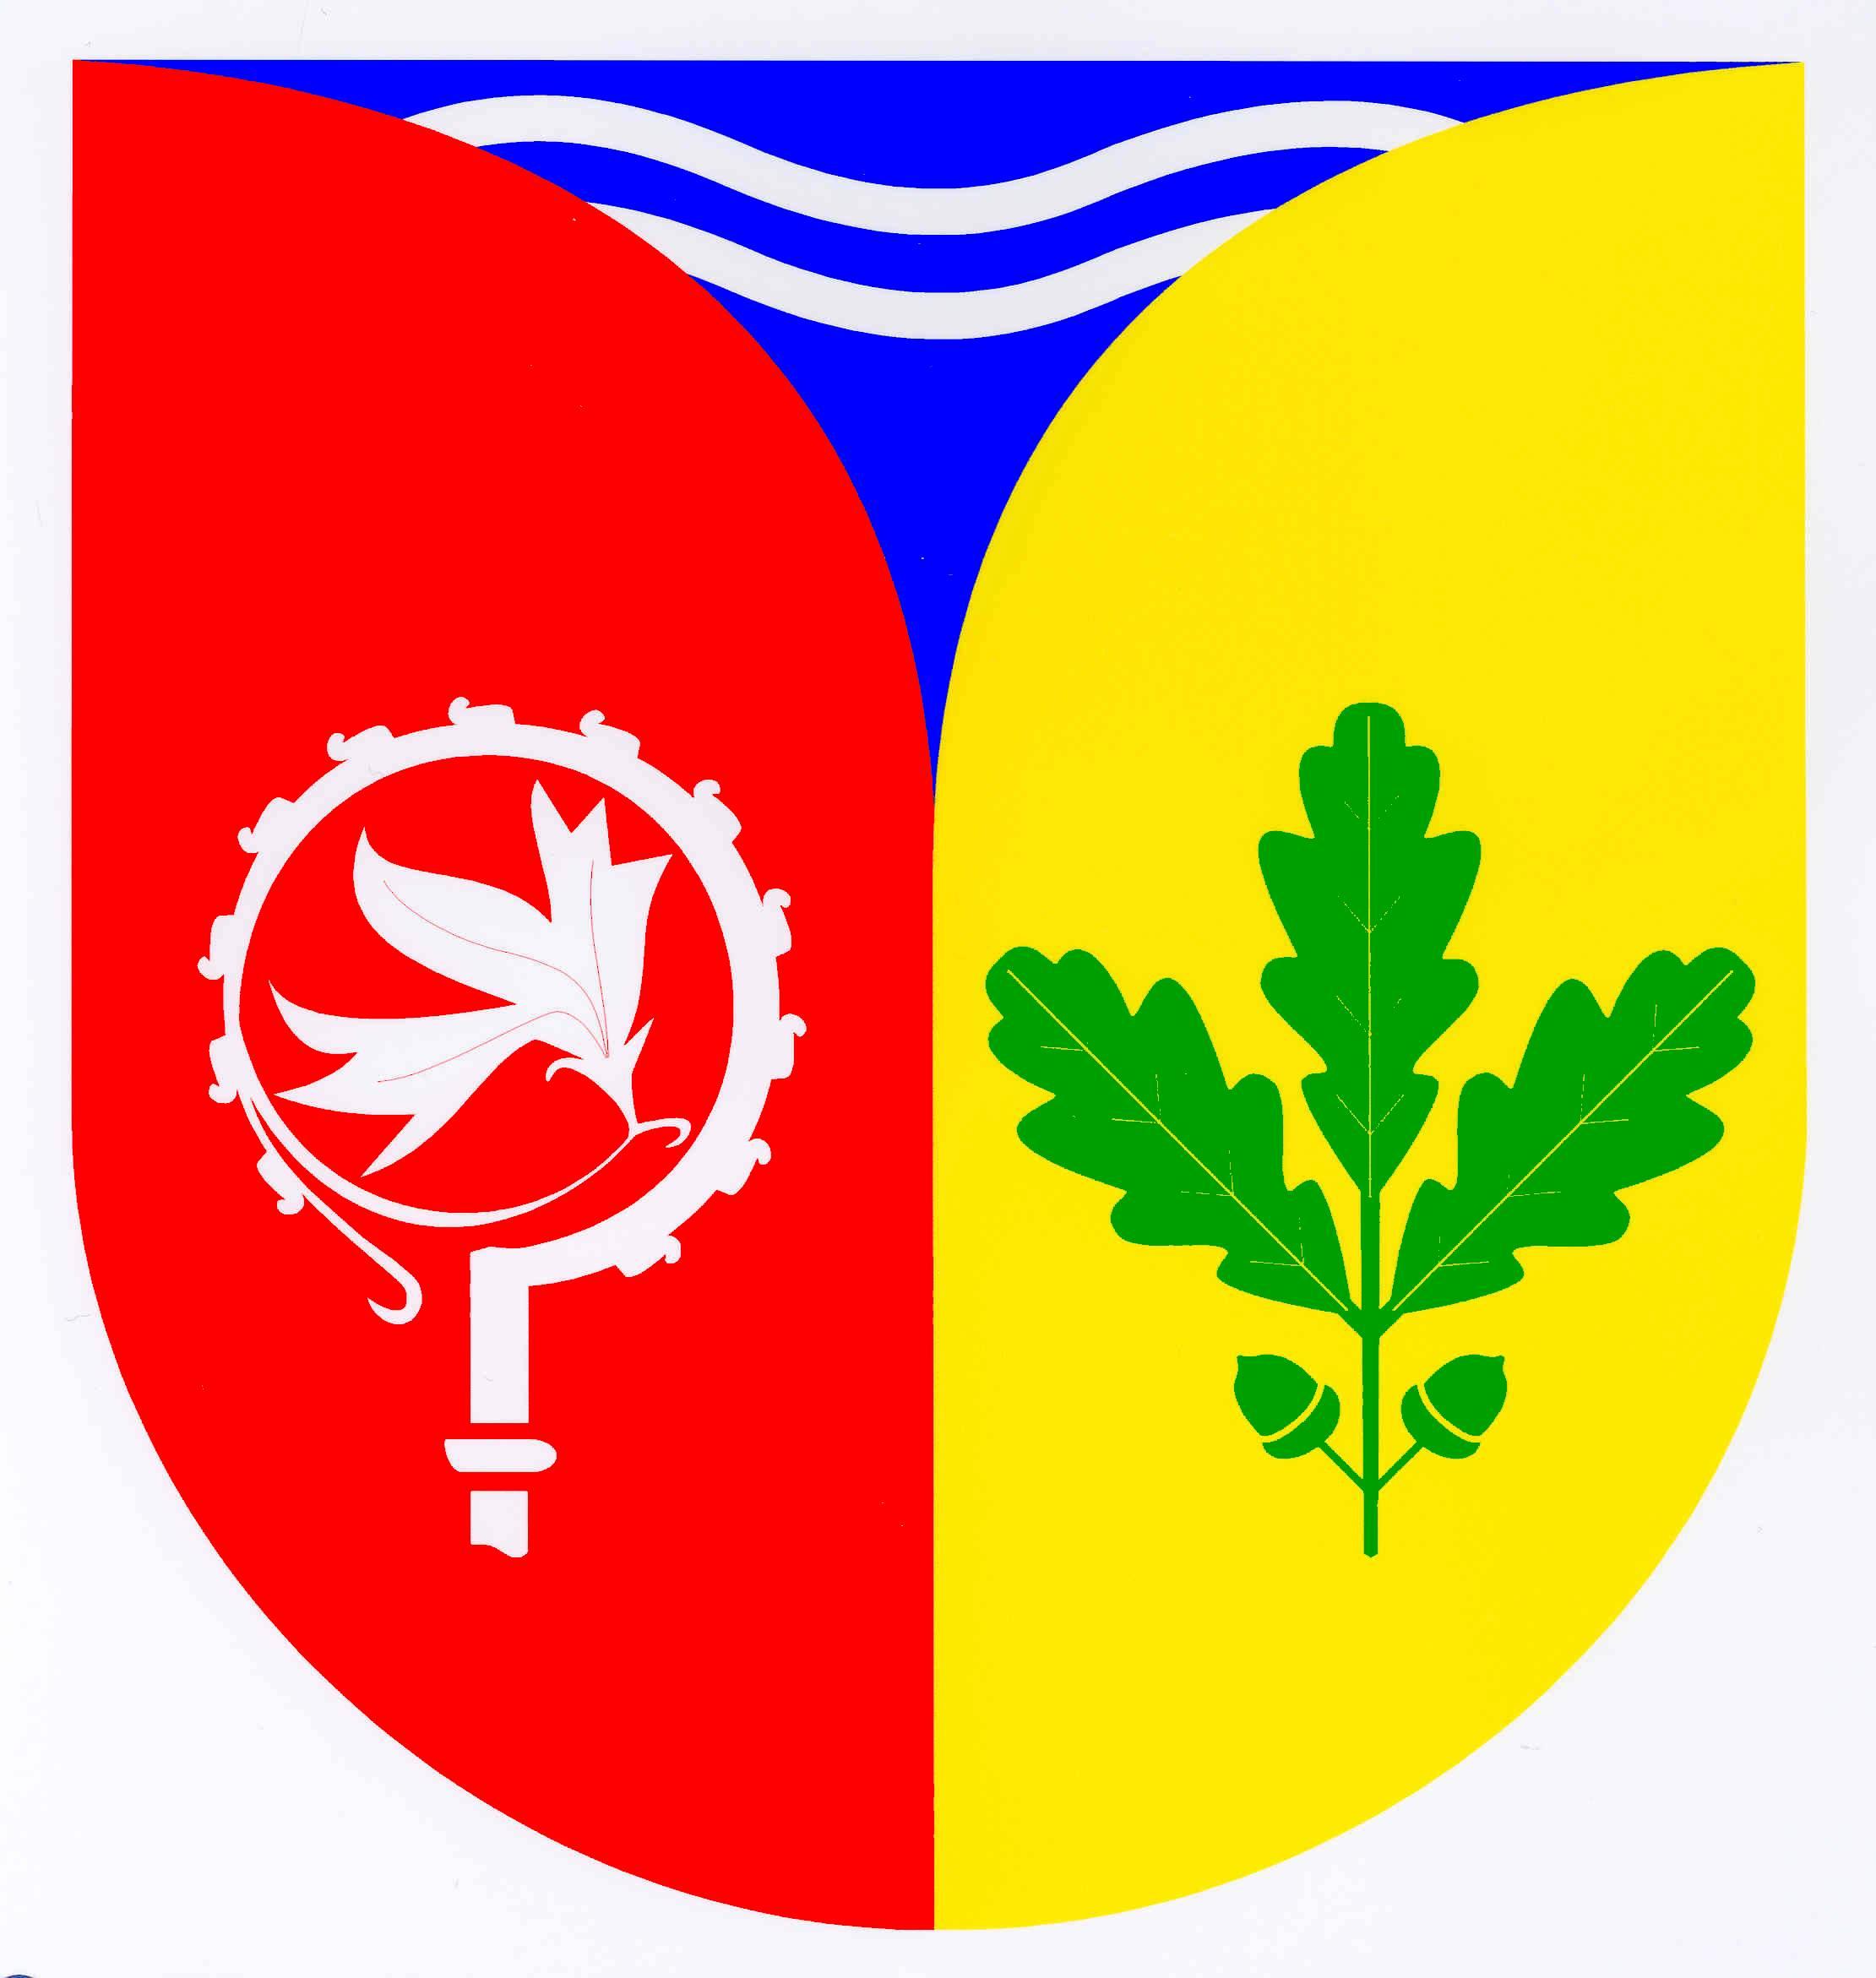 Wappen StadtSchwentinental, Kreis Plön